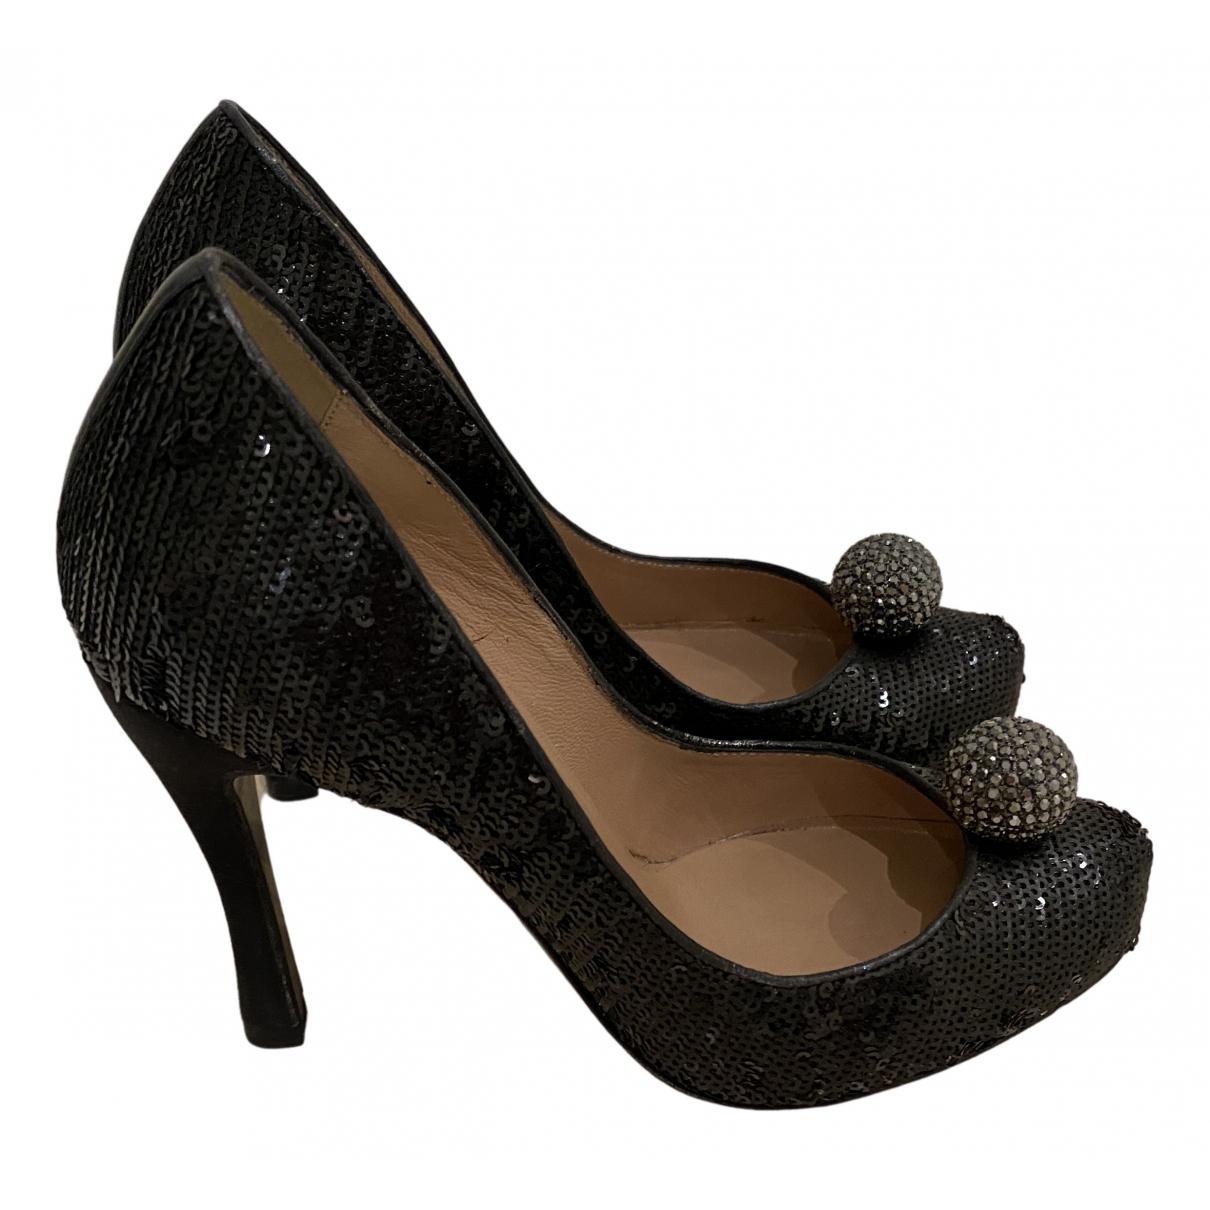 Emporio Armani N Black Glitter Heels for Women 35 IT